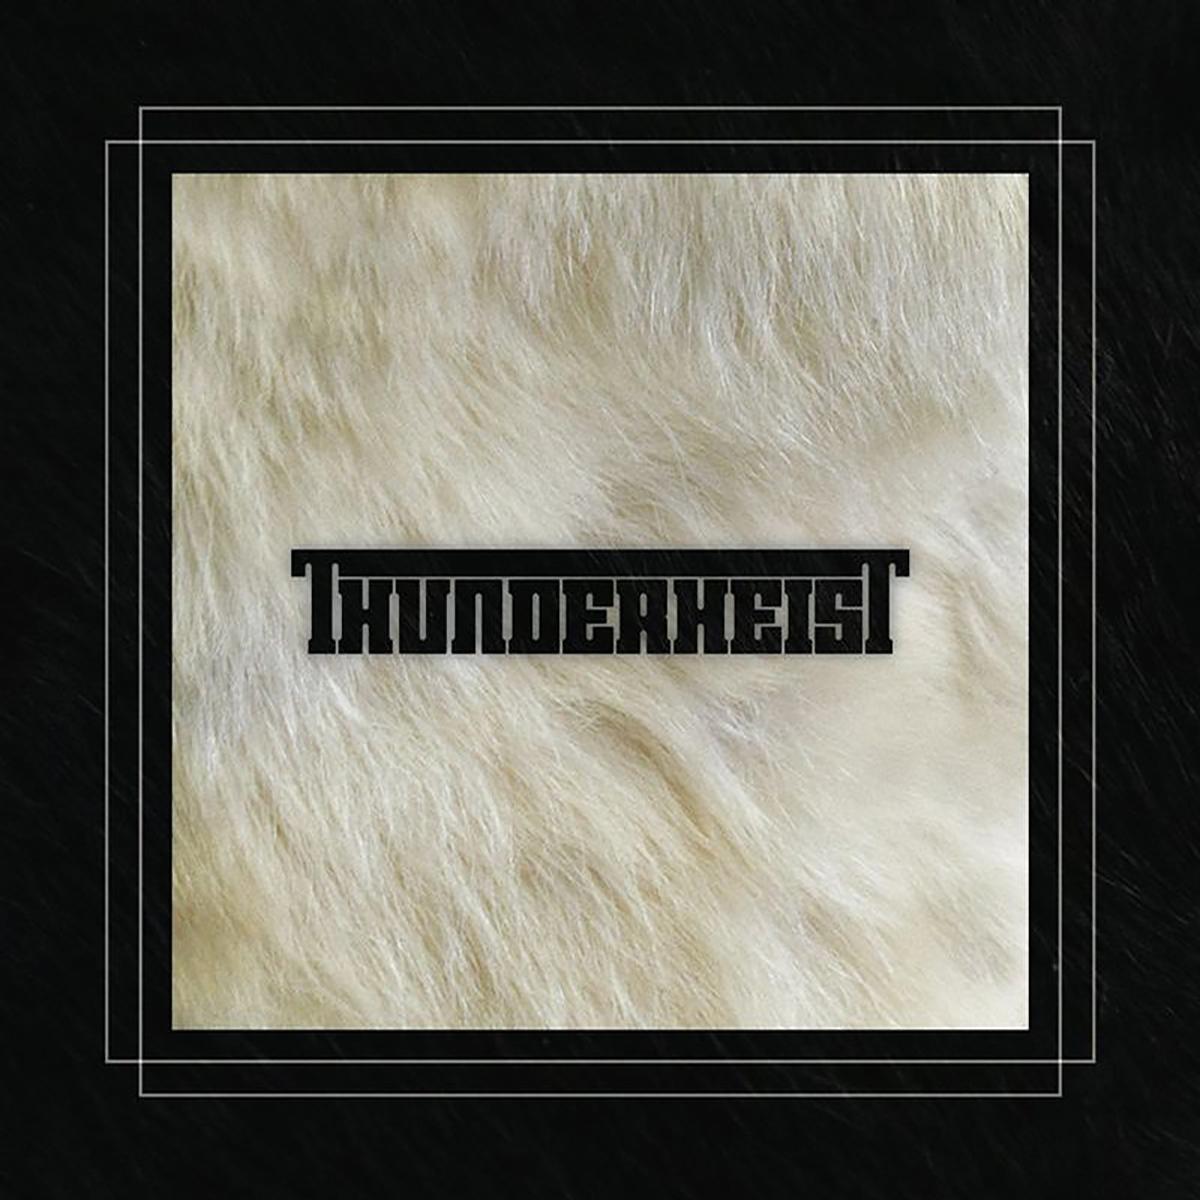 Thunderheist, Thunderheist